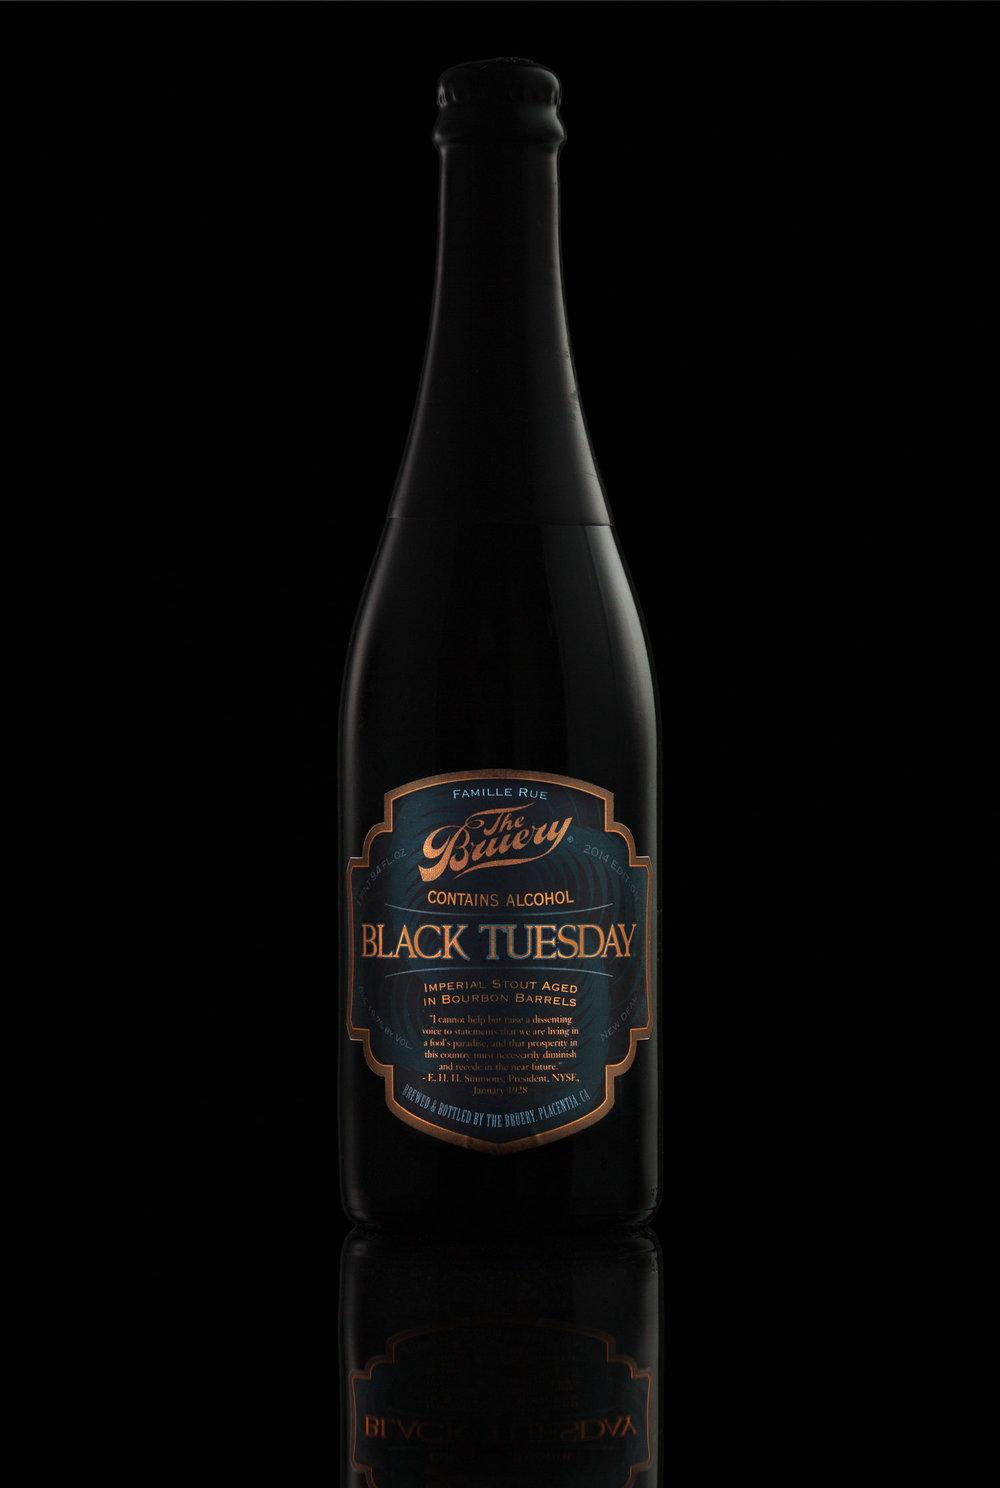 The Bruery Black Tuesday Bottle on black background. Craft beer.